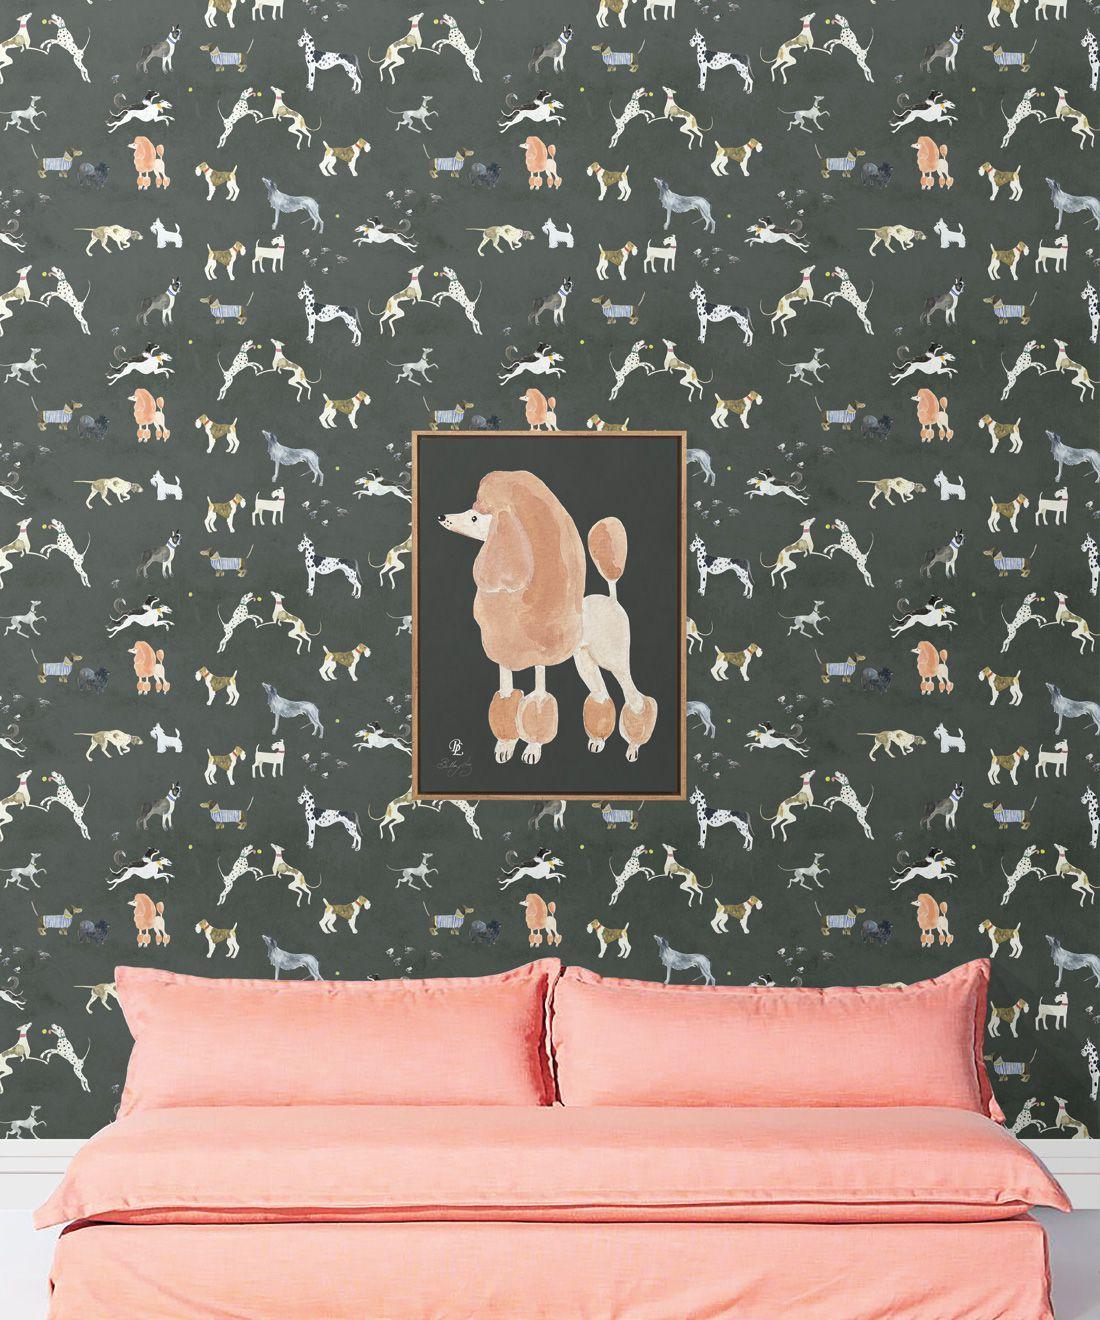 Doggies Wallpaper •Dog Wallpaper •Charcoal • Insitu with salmon colored sofa